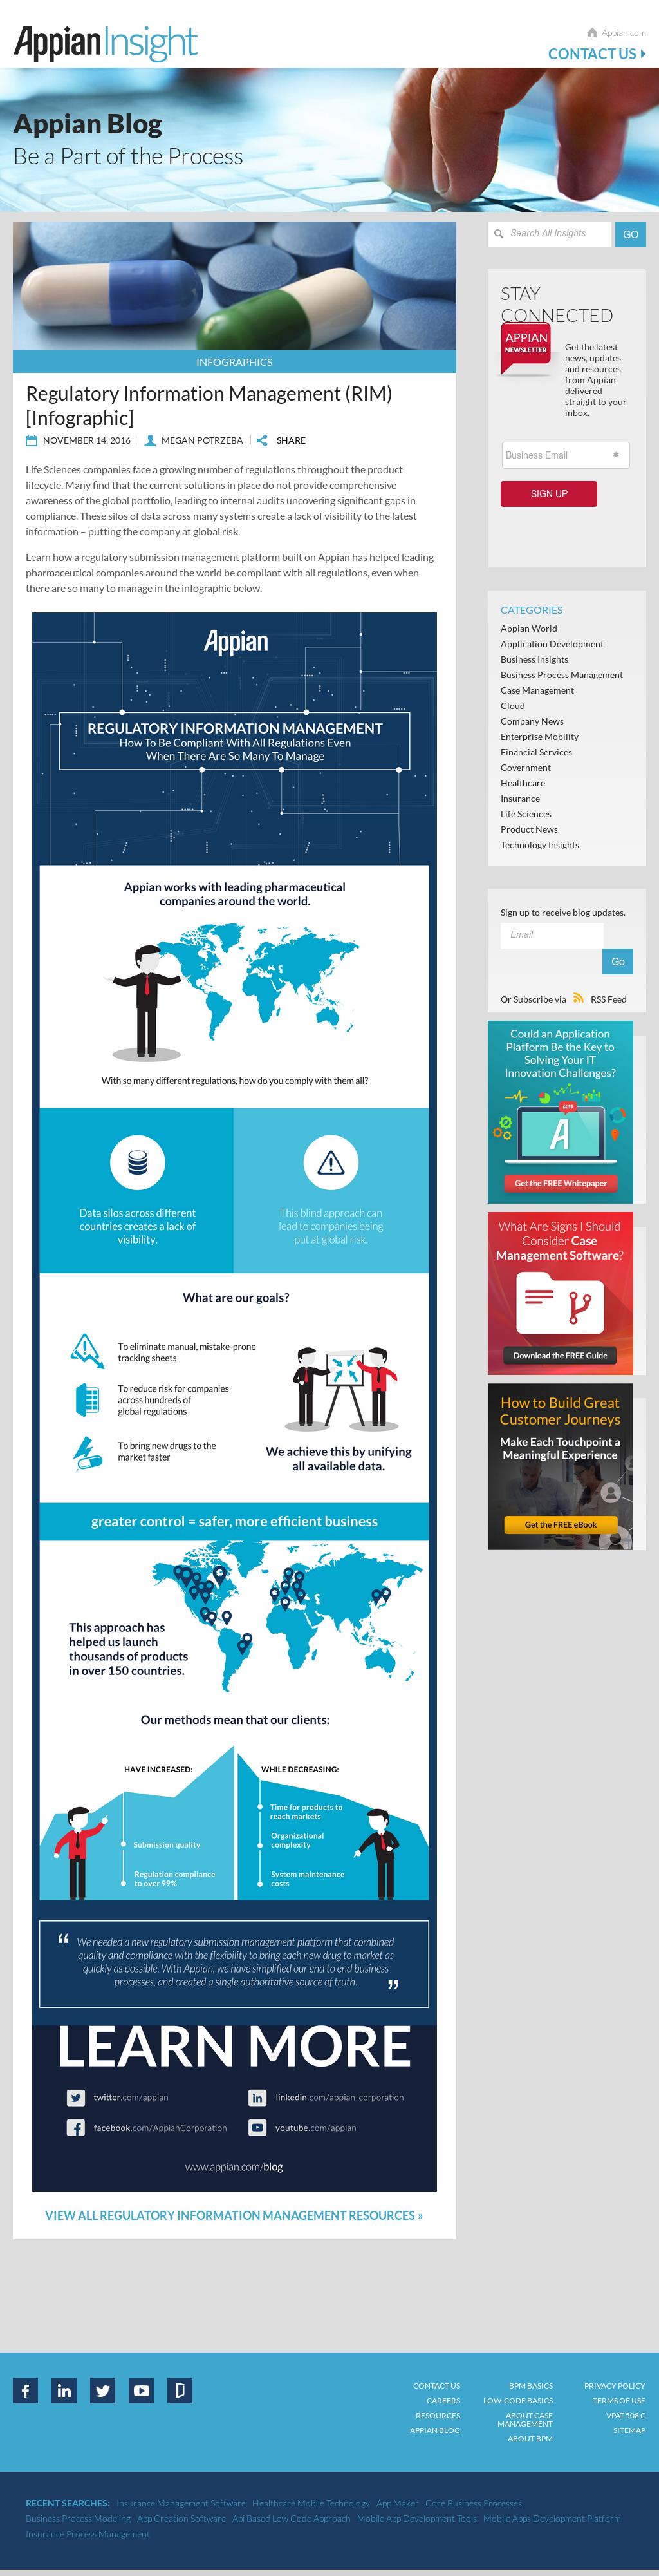 [Infographic] Regulatory Information Management (RIM)